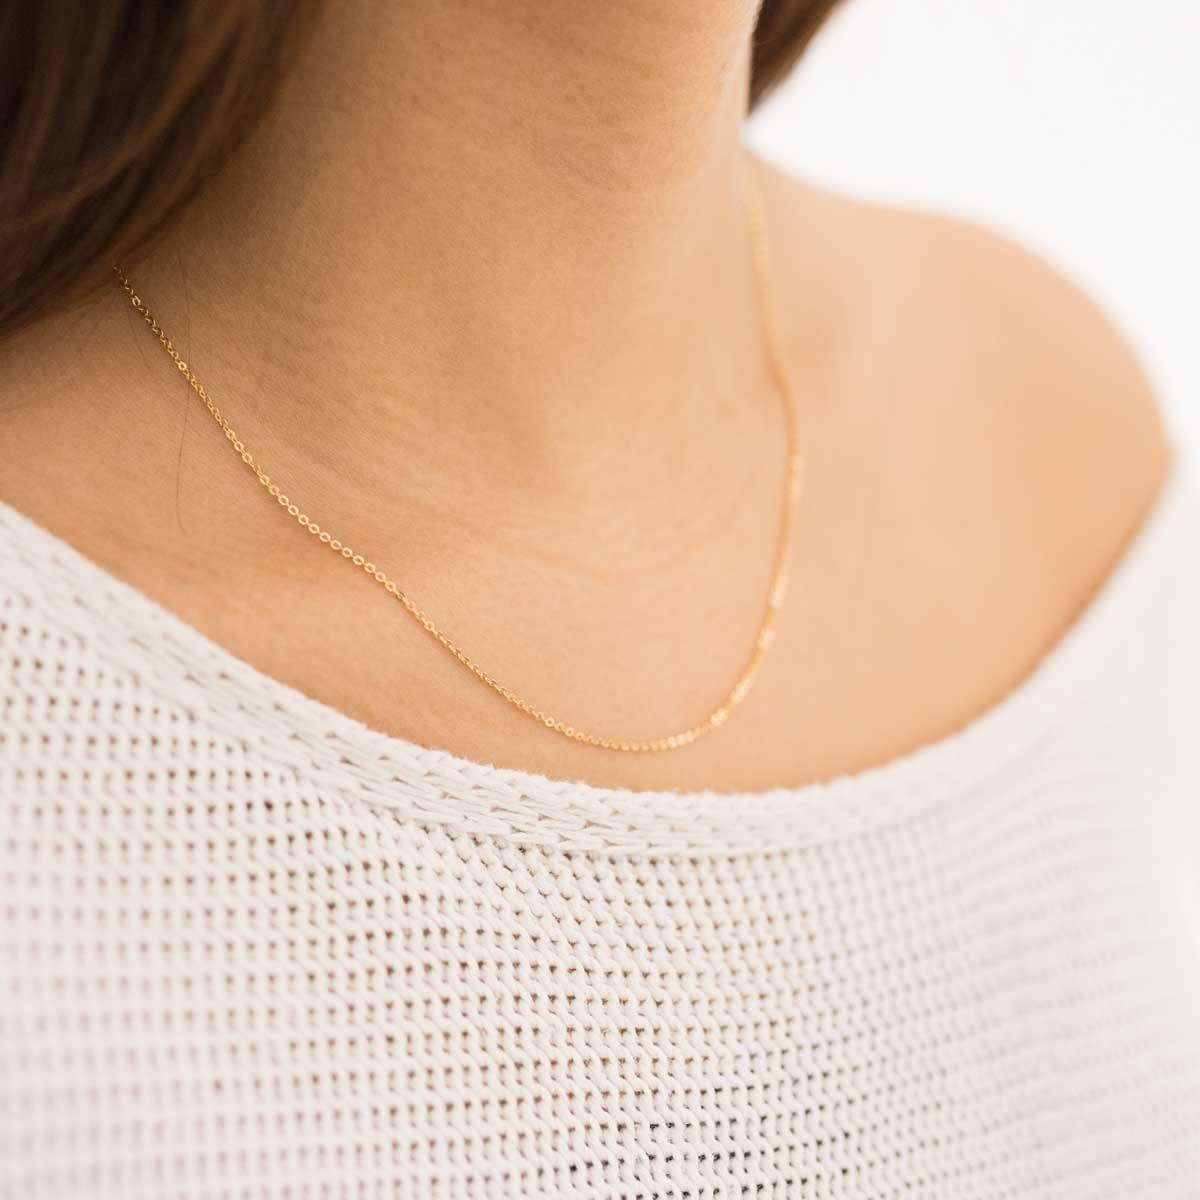 10 Halsketten vergoldet 40 cm x 1 mm